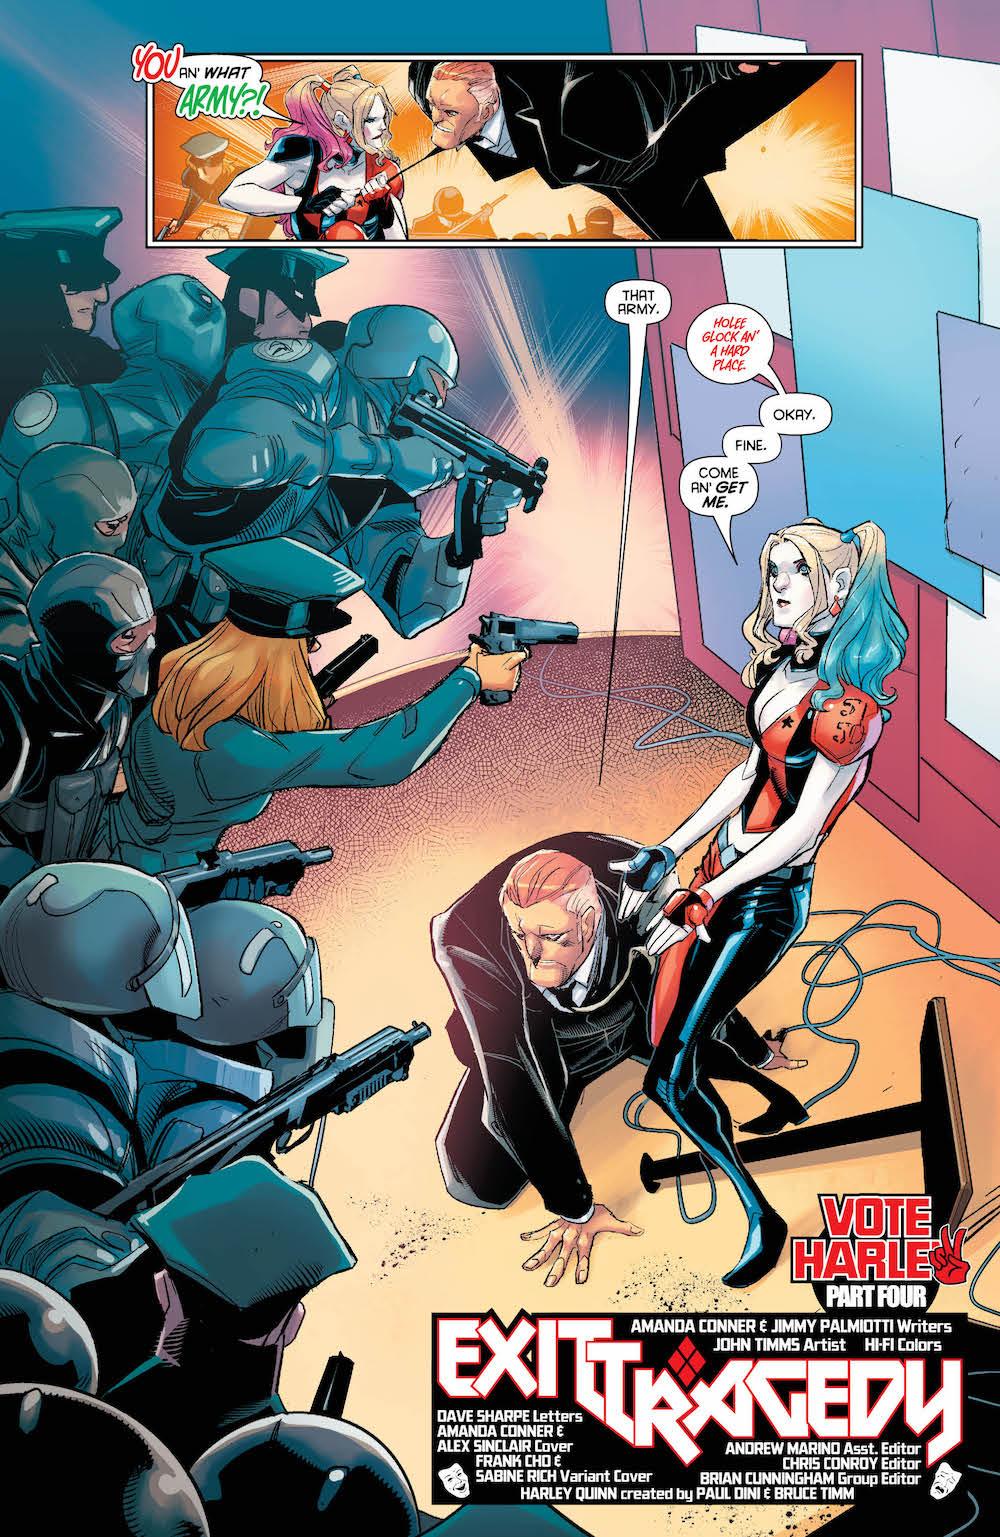 Harley Quinn 2017